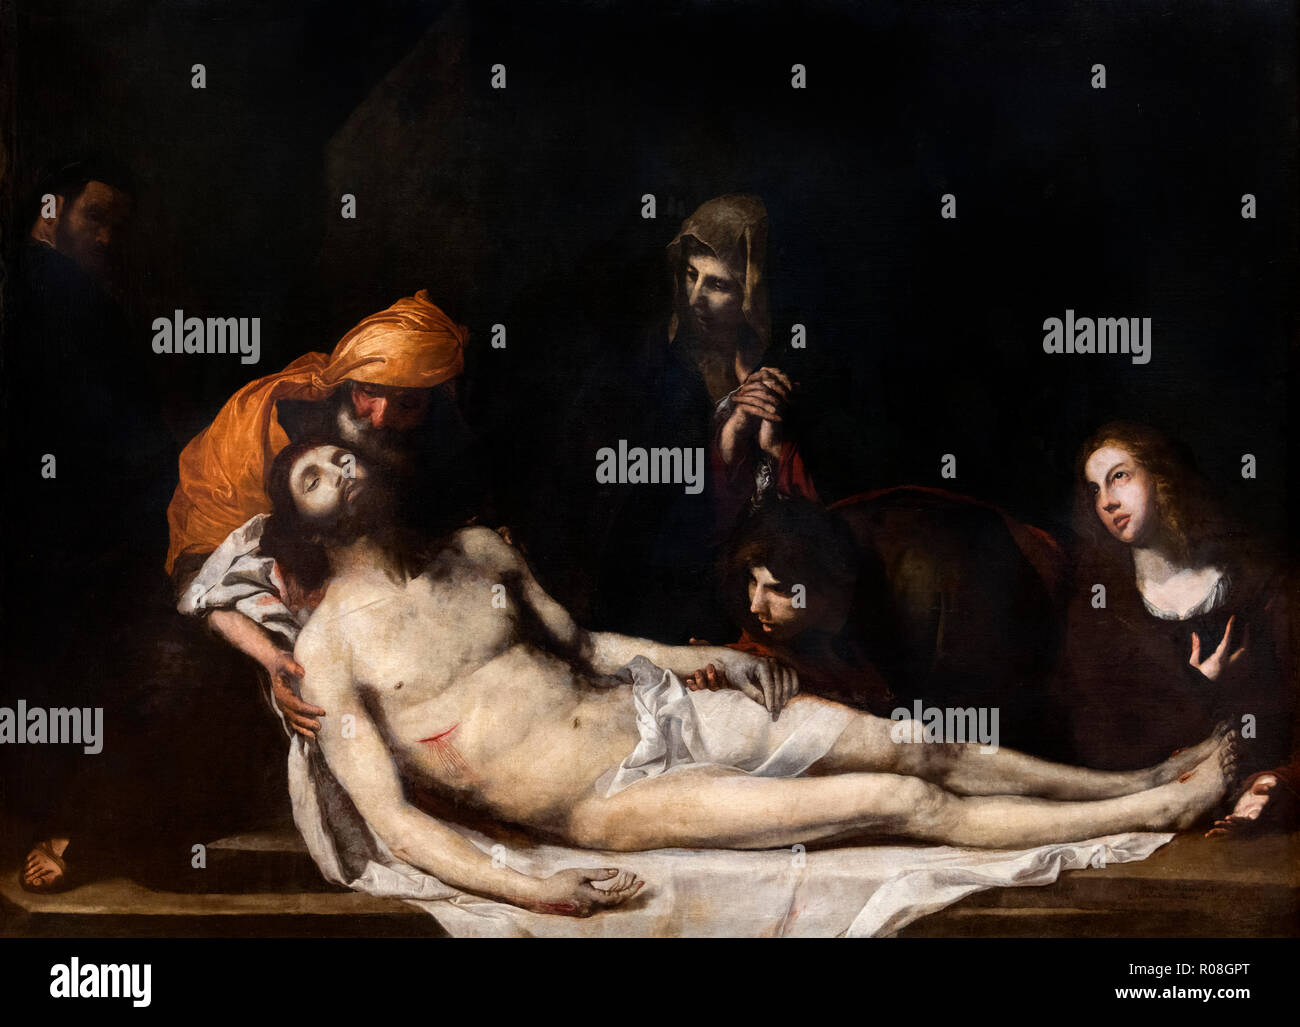 The Burial of Christ by Jose de Ribera (Jusepe de Ribera c.1588/91- 1652/6), oil on canvas, 1645 - Stock Image